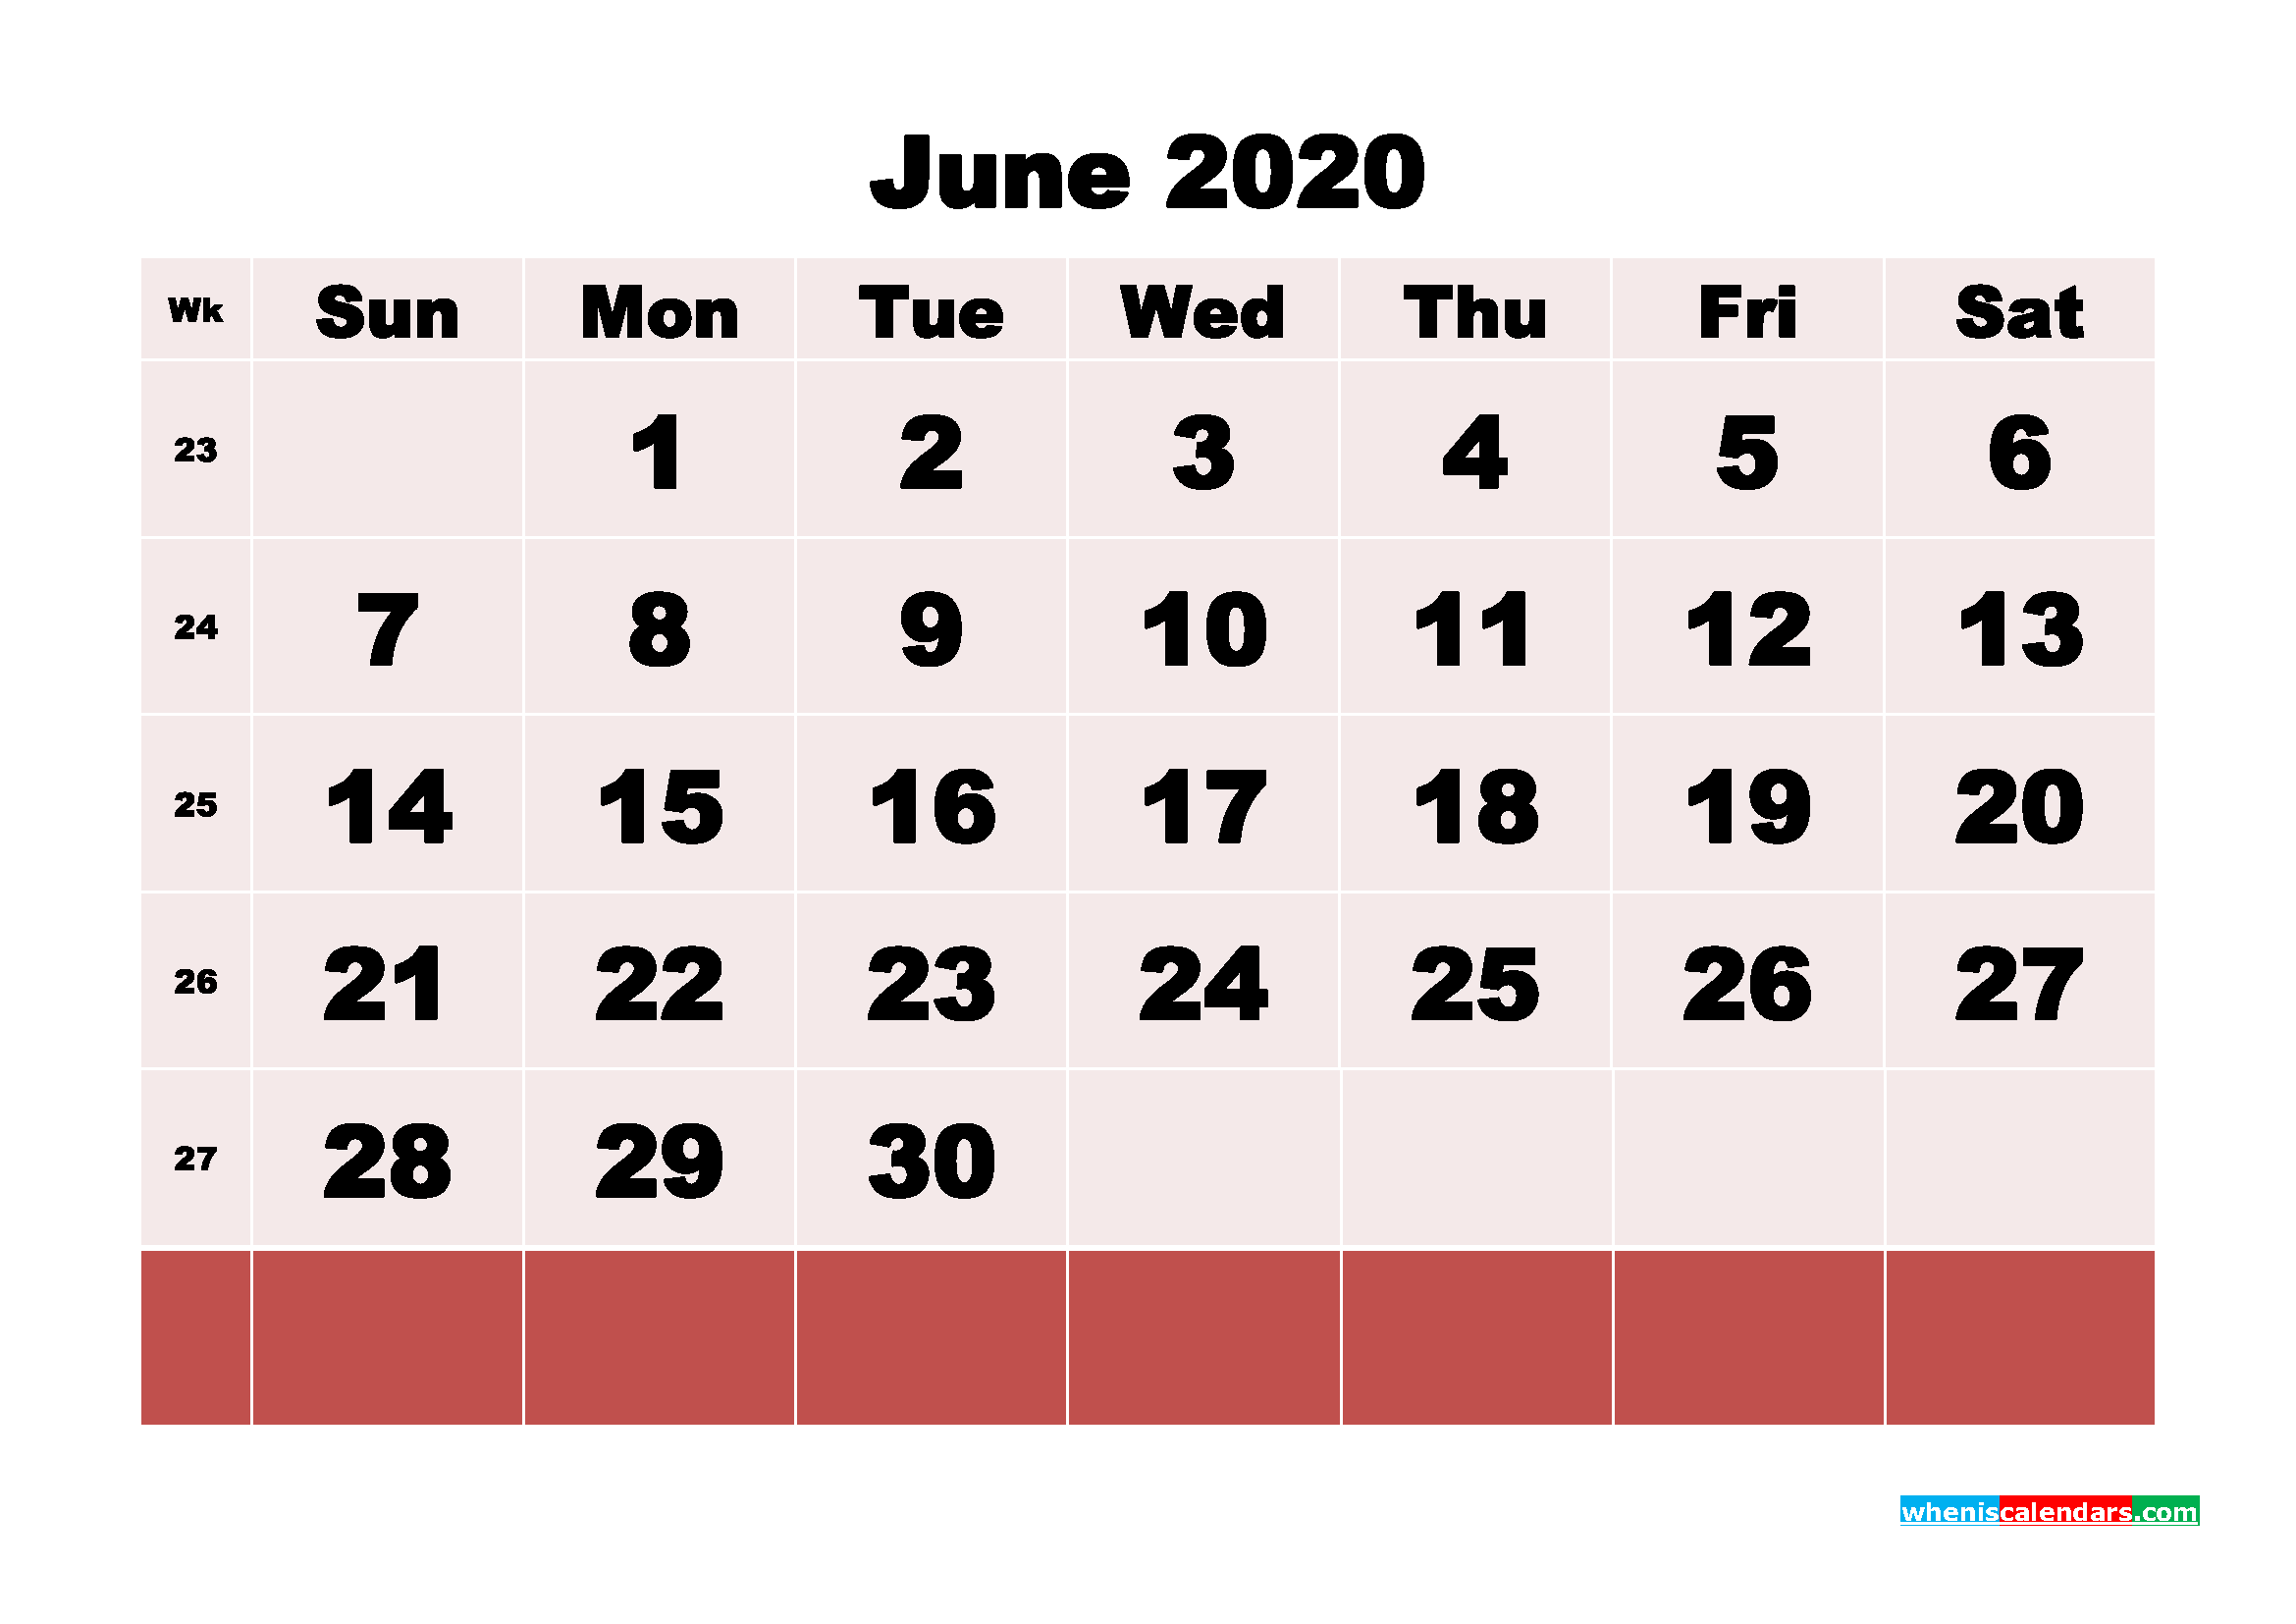 Free Printable June 2020 Calendar - No.m20b102